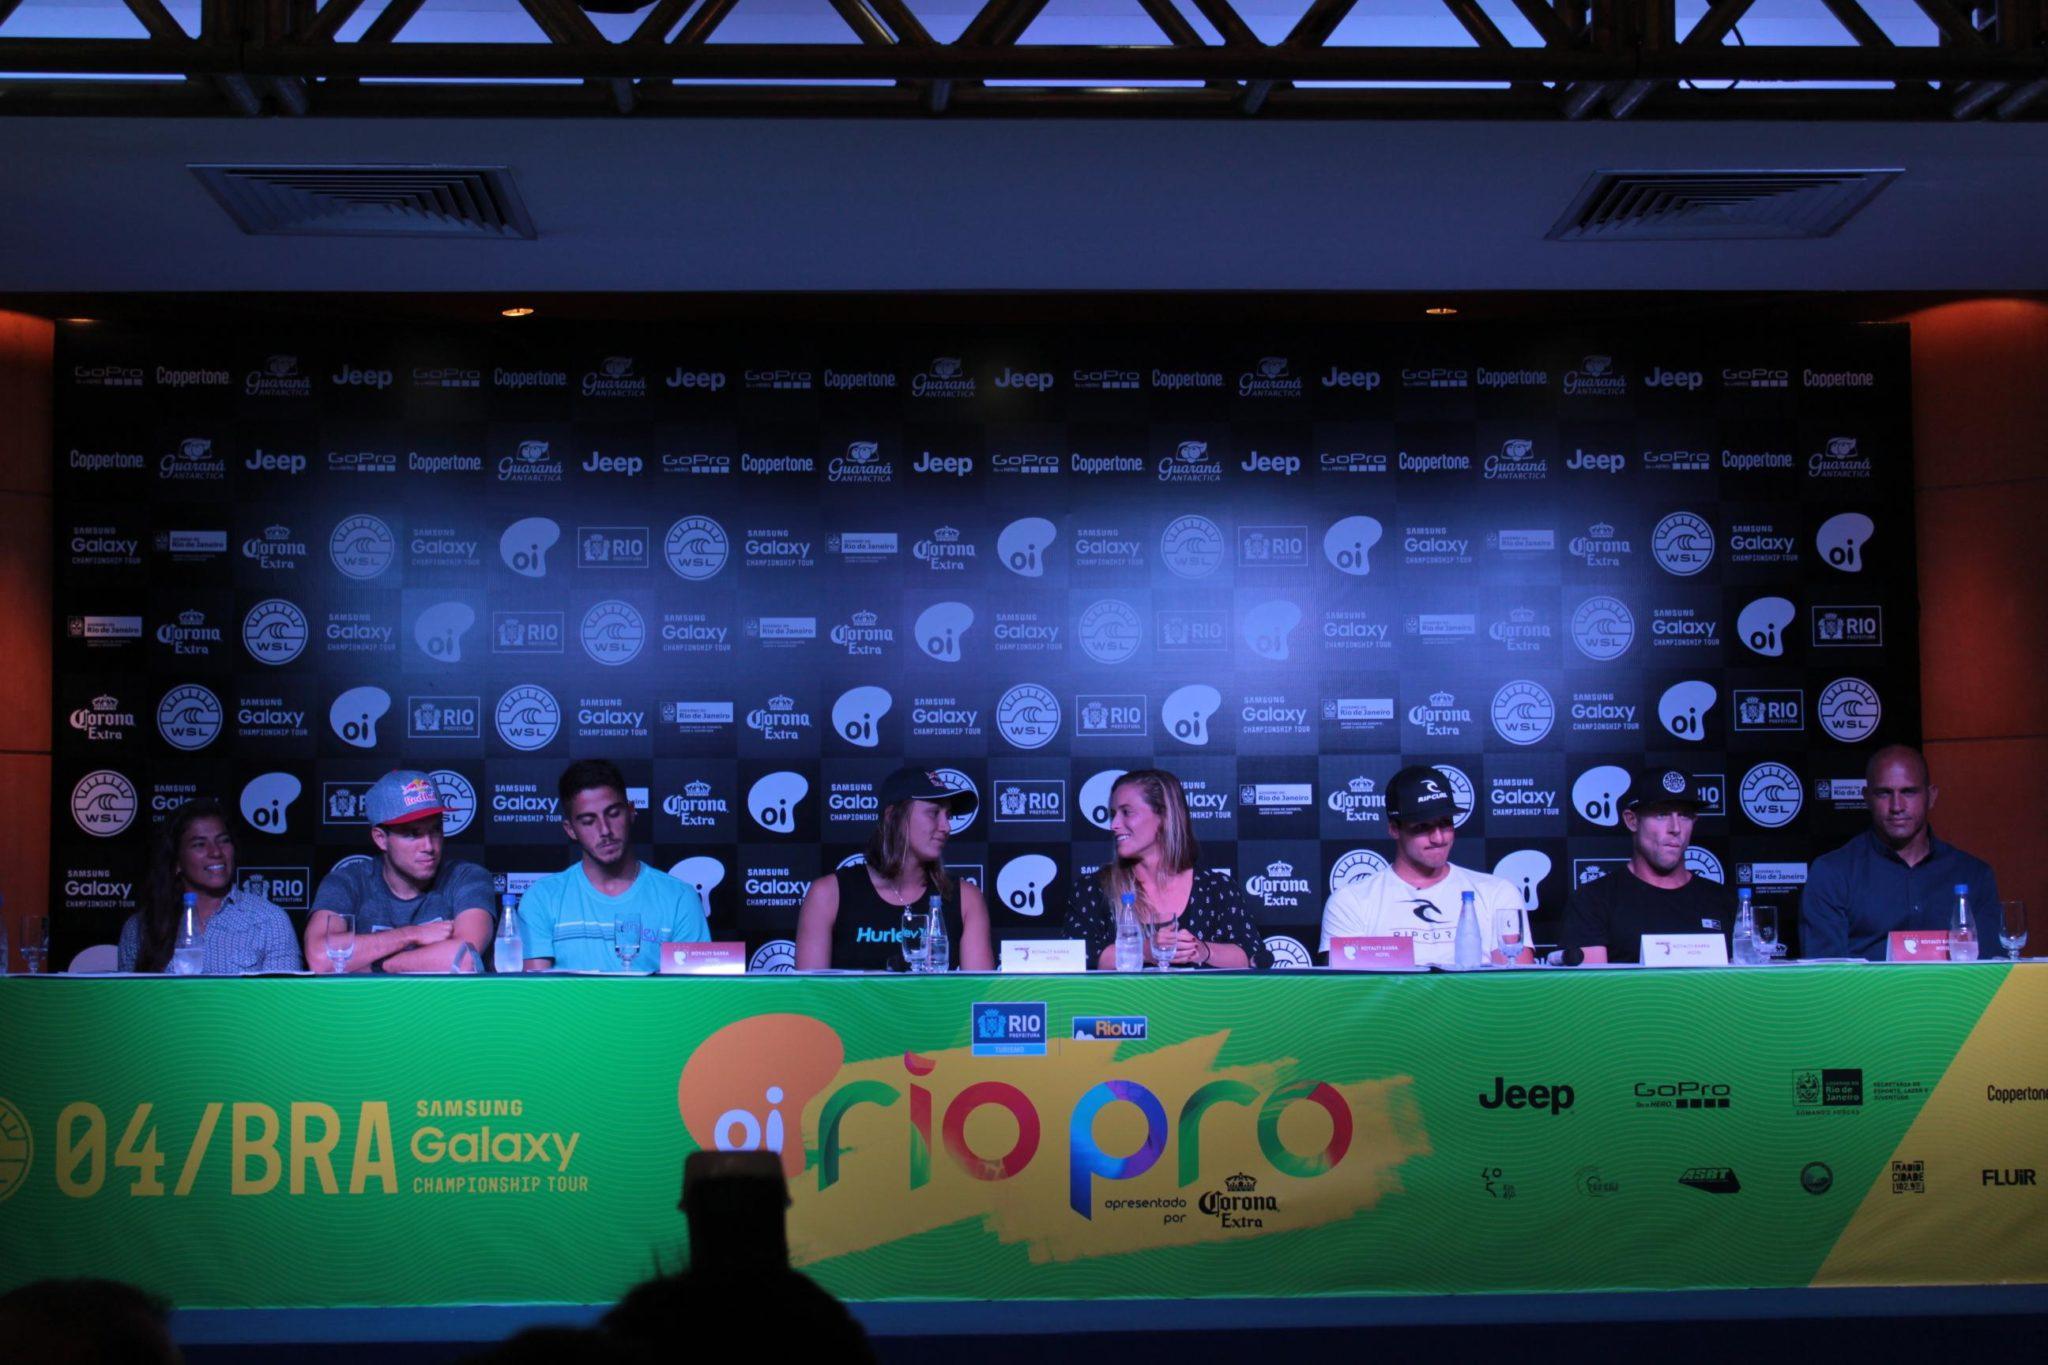 Oi Rio Pro realiza coletiva de imprensa nesta quinta-feira